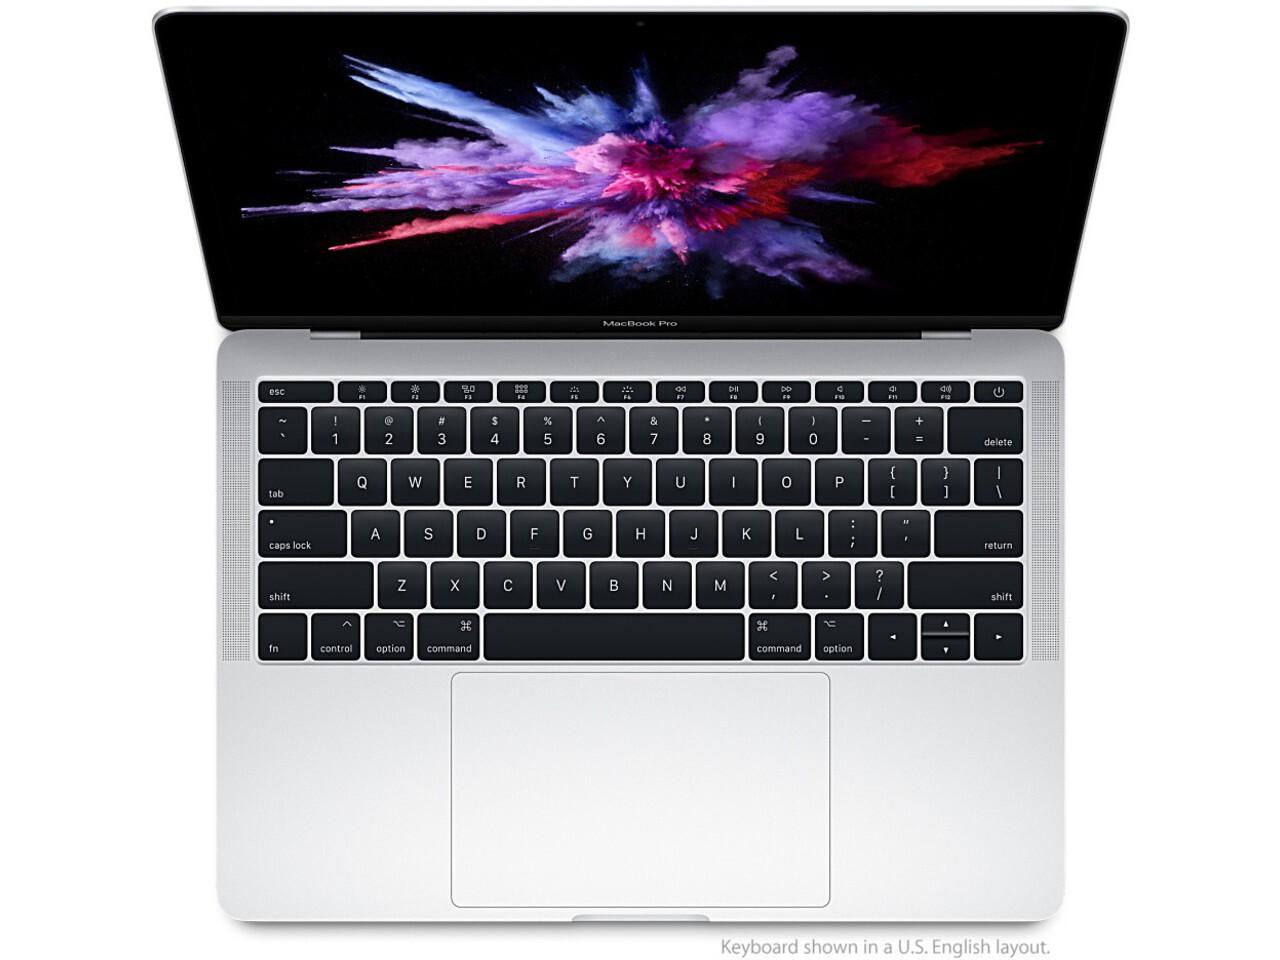 macbook pro 13 inch 2017 silver